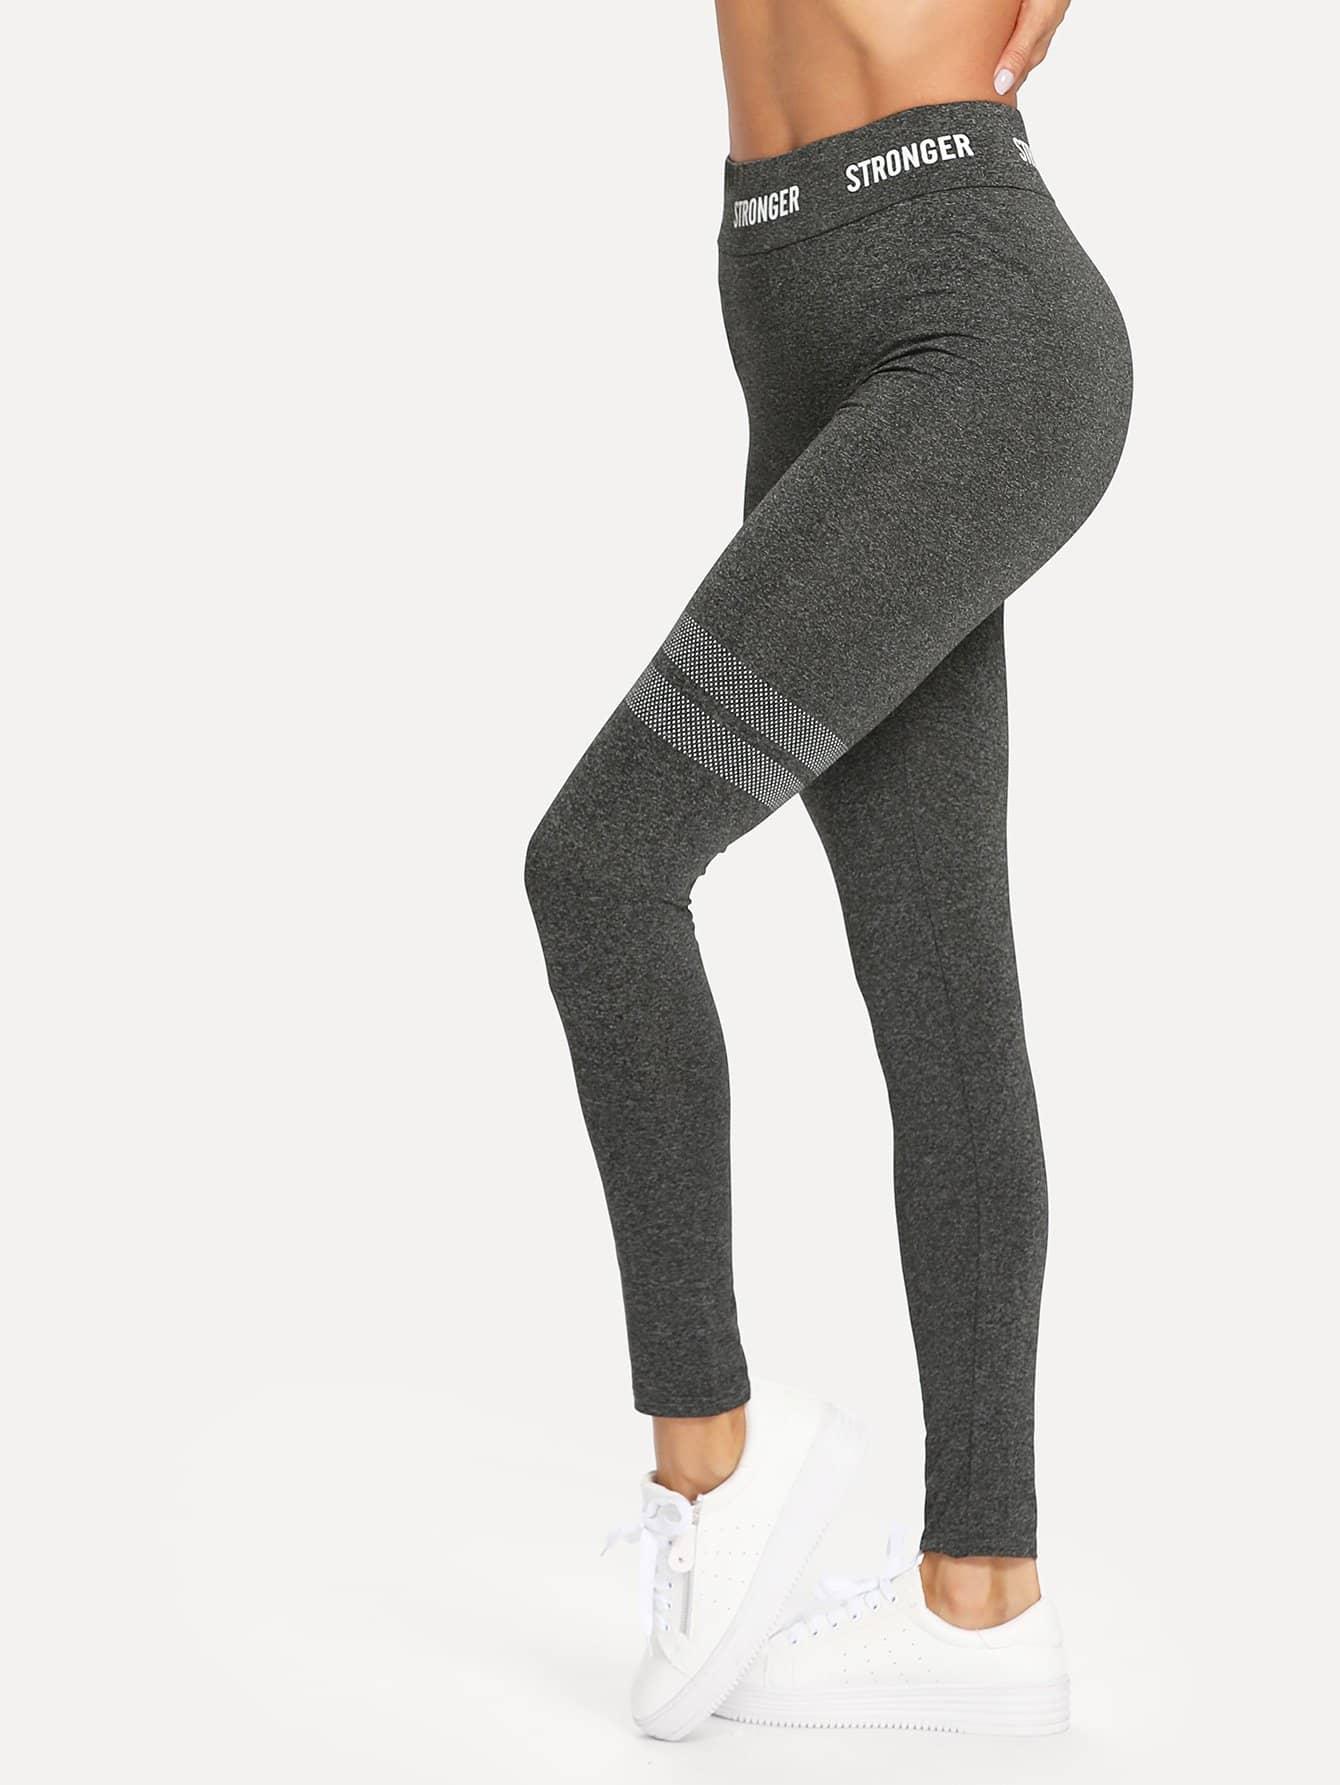 High Waist Letter Print Side Stretchy Leggings stretchy printed leggings